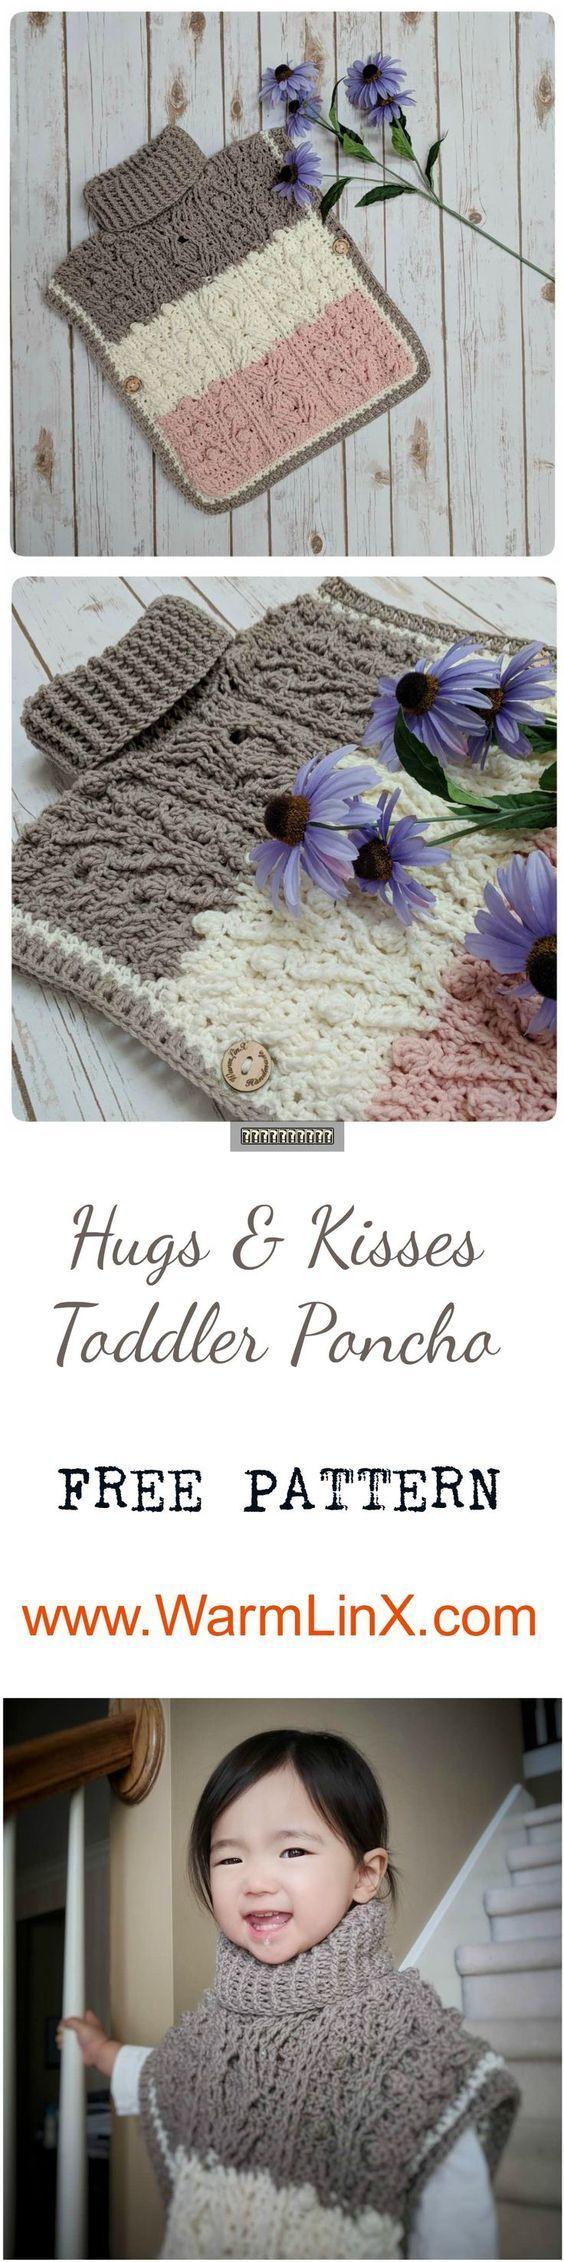 "Hugs & Kisses Toddler Poncho ""Neapolitan ice cream"" Crochet Pattern ..."